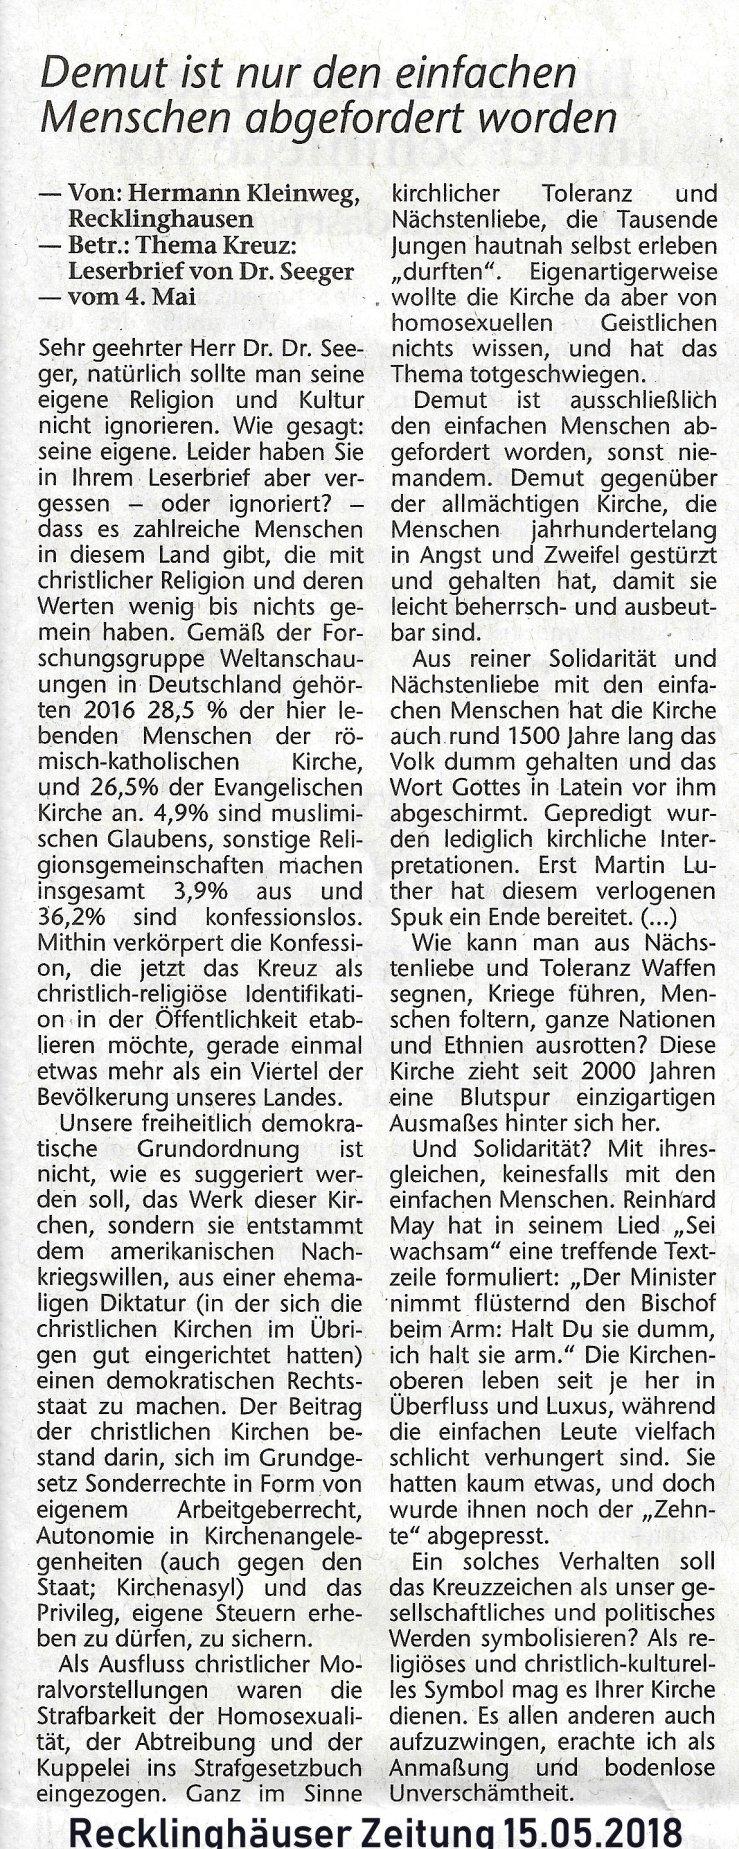 Mh. Bauer, Marl, Leserbrief zu Christentum u. Kirchen, 15.05.2018